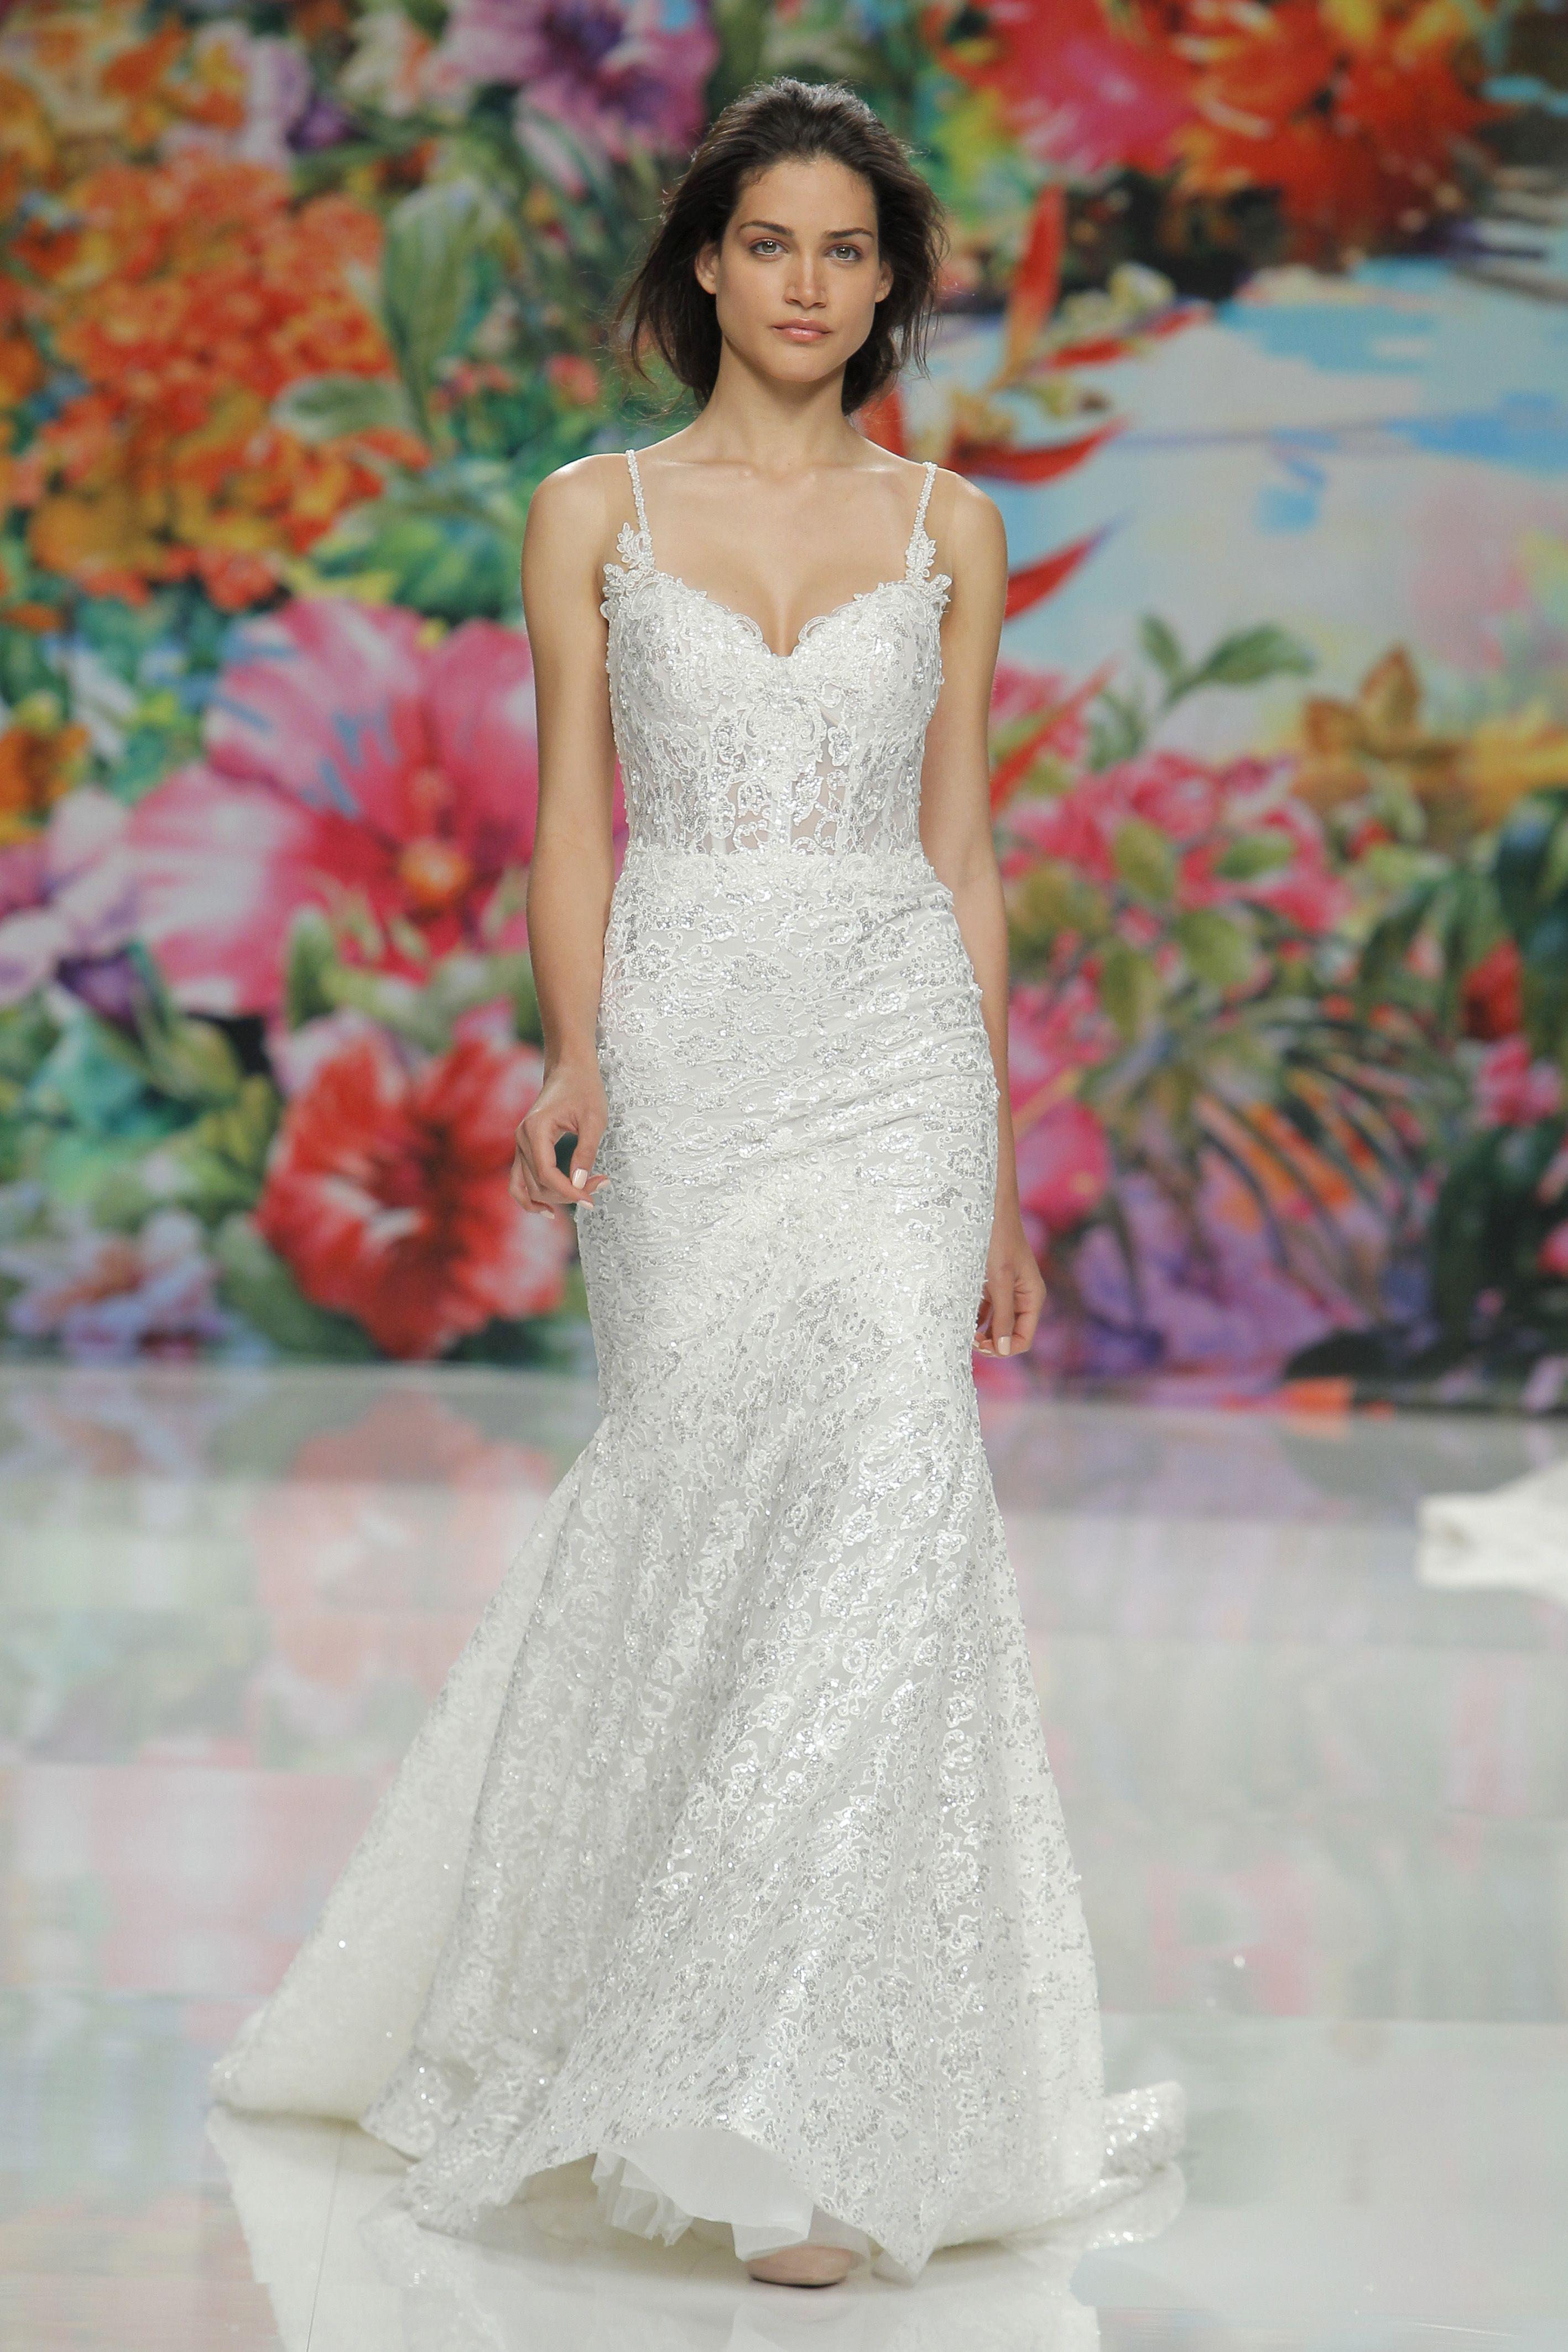 Barcelona Bridal Fashion Week S Best Dressed Wedding Dresses For Tall Women Wedding Dress Styles Pretty Wedding Dresses